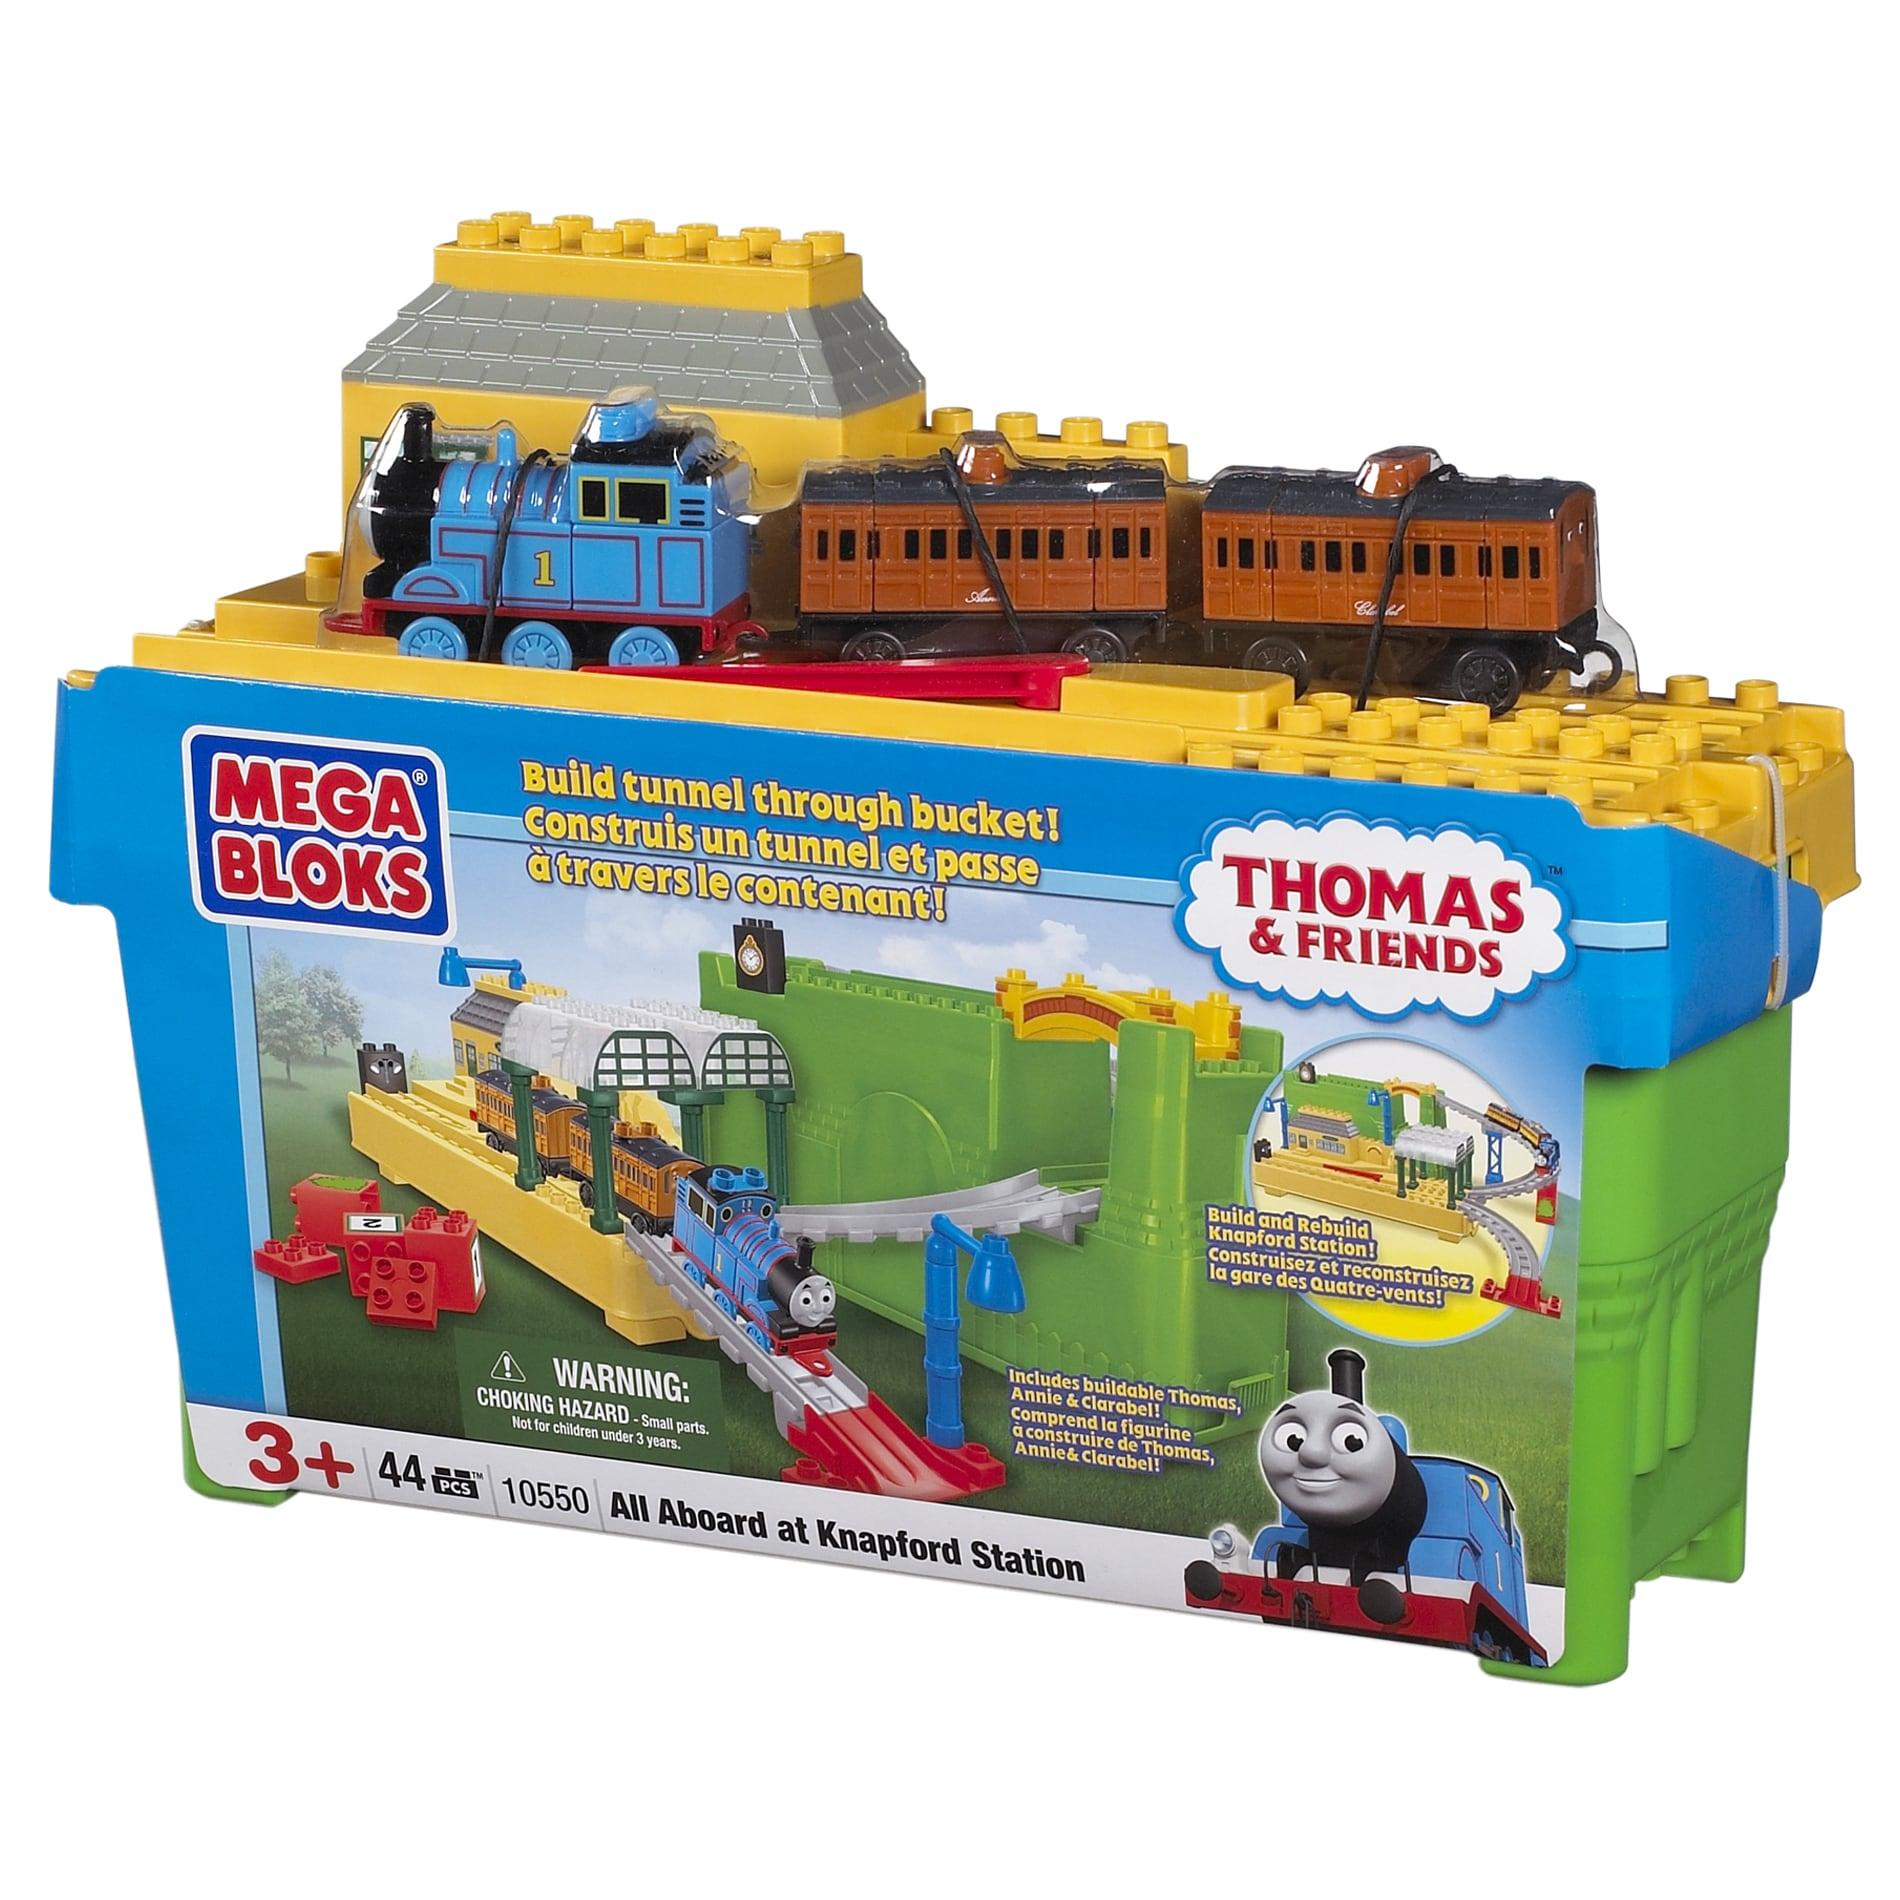 Mega Bloks Thomas and Friends 'All Aboard Knapford Station' Play Set